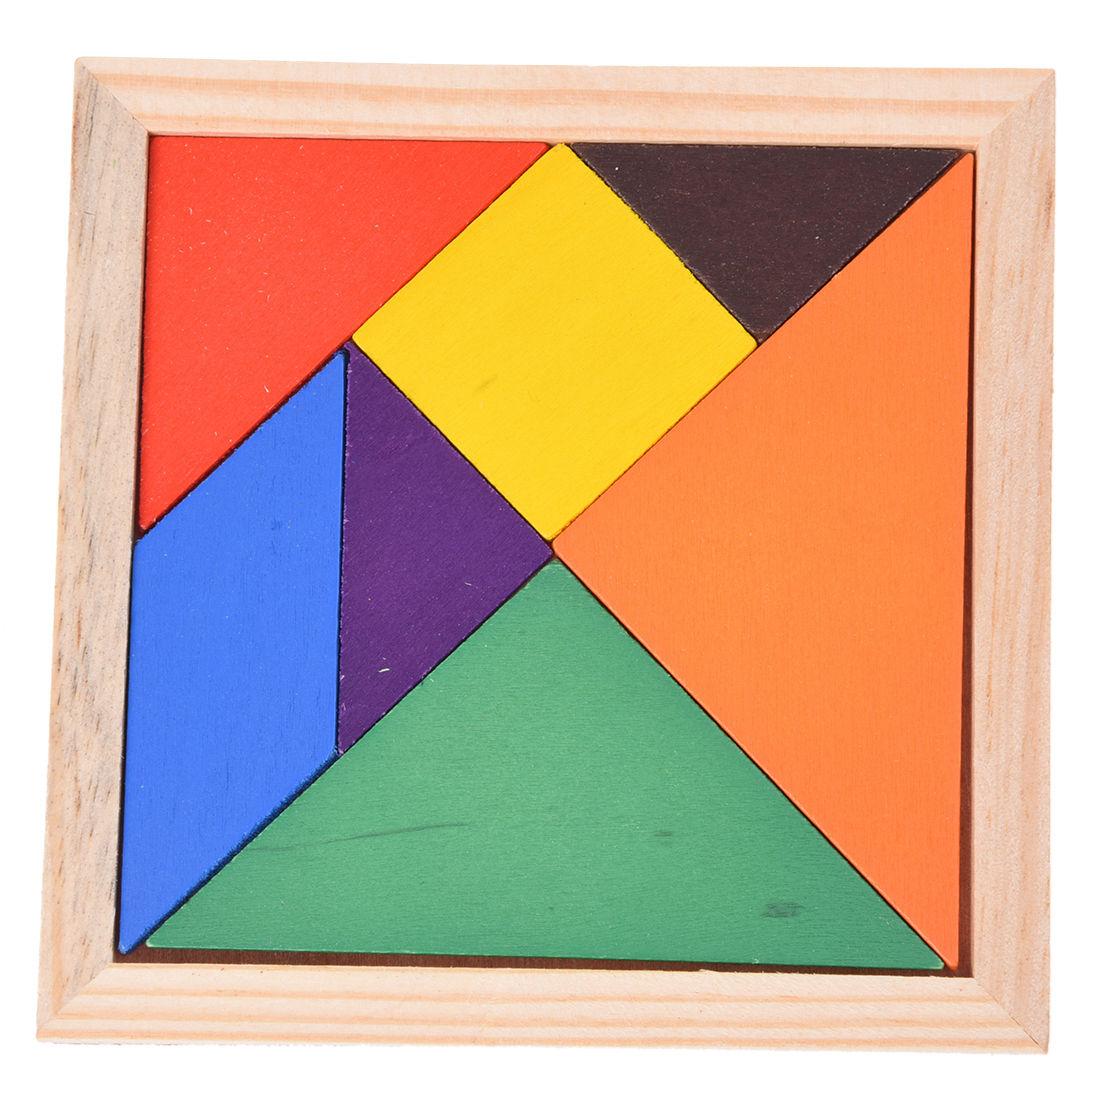 Educational Wooden Seven Piece Puzzle Jigsaw Tangram Brain